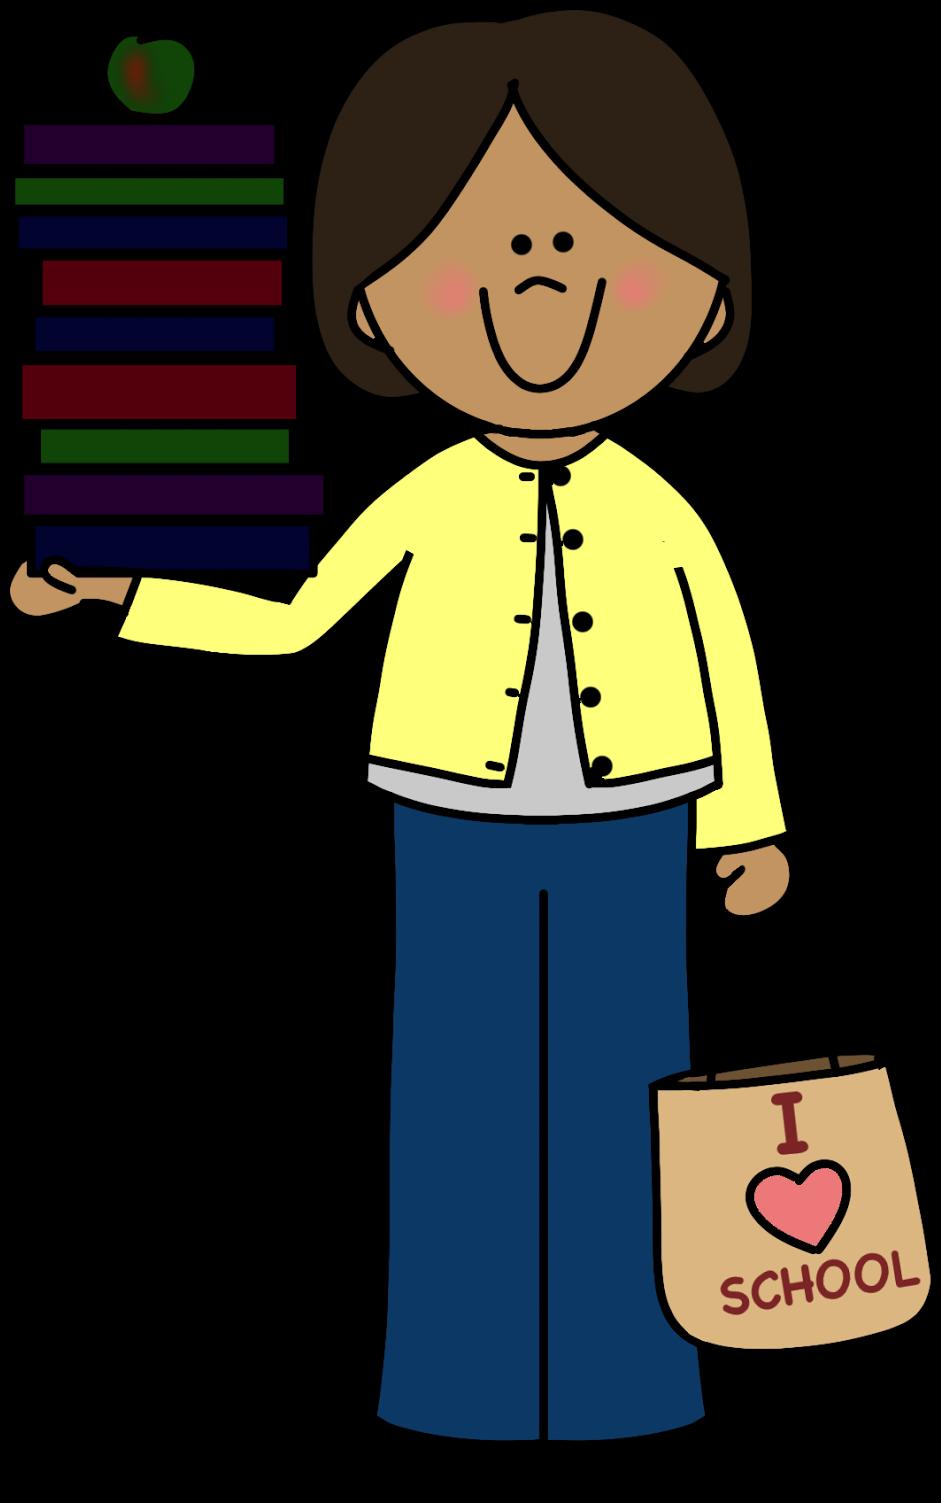 Transparent school clipart - Clip Art Clip Art Human - Free Clip Art Teacher